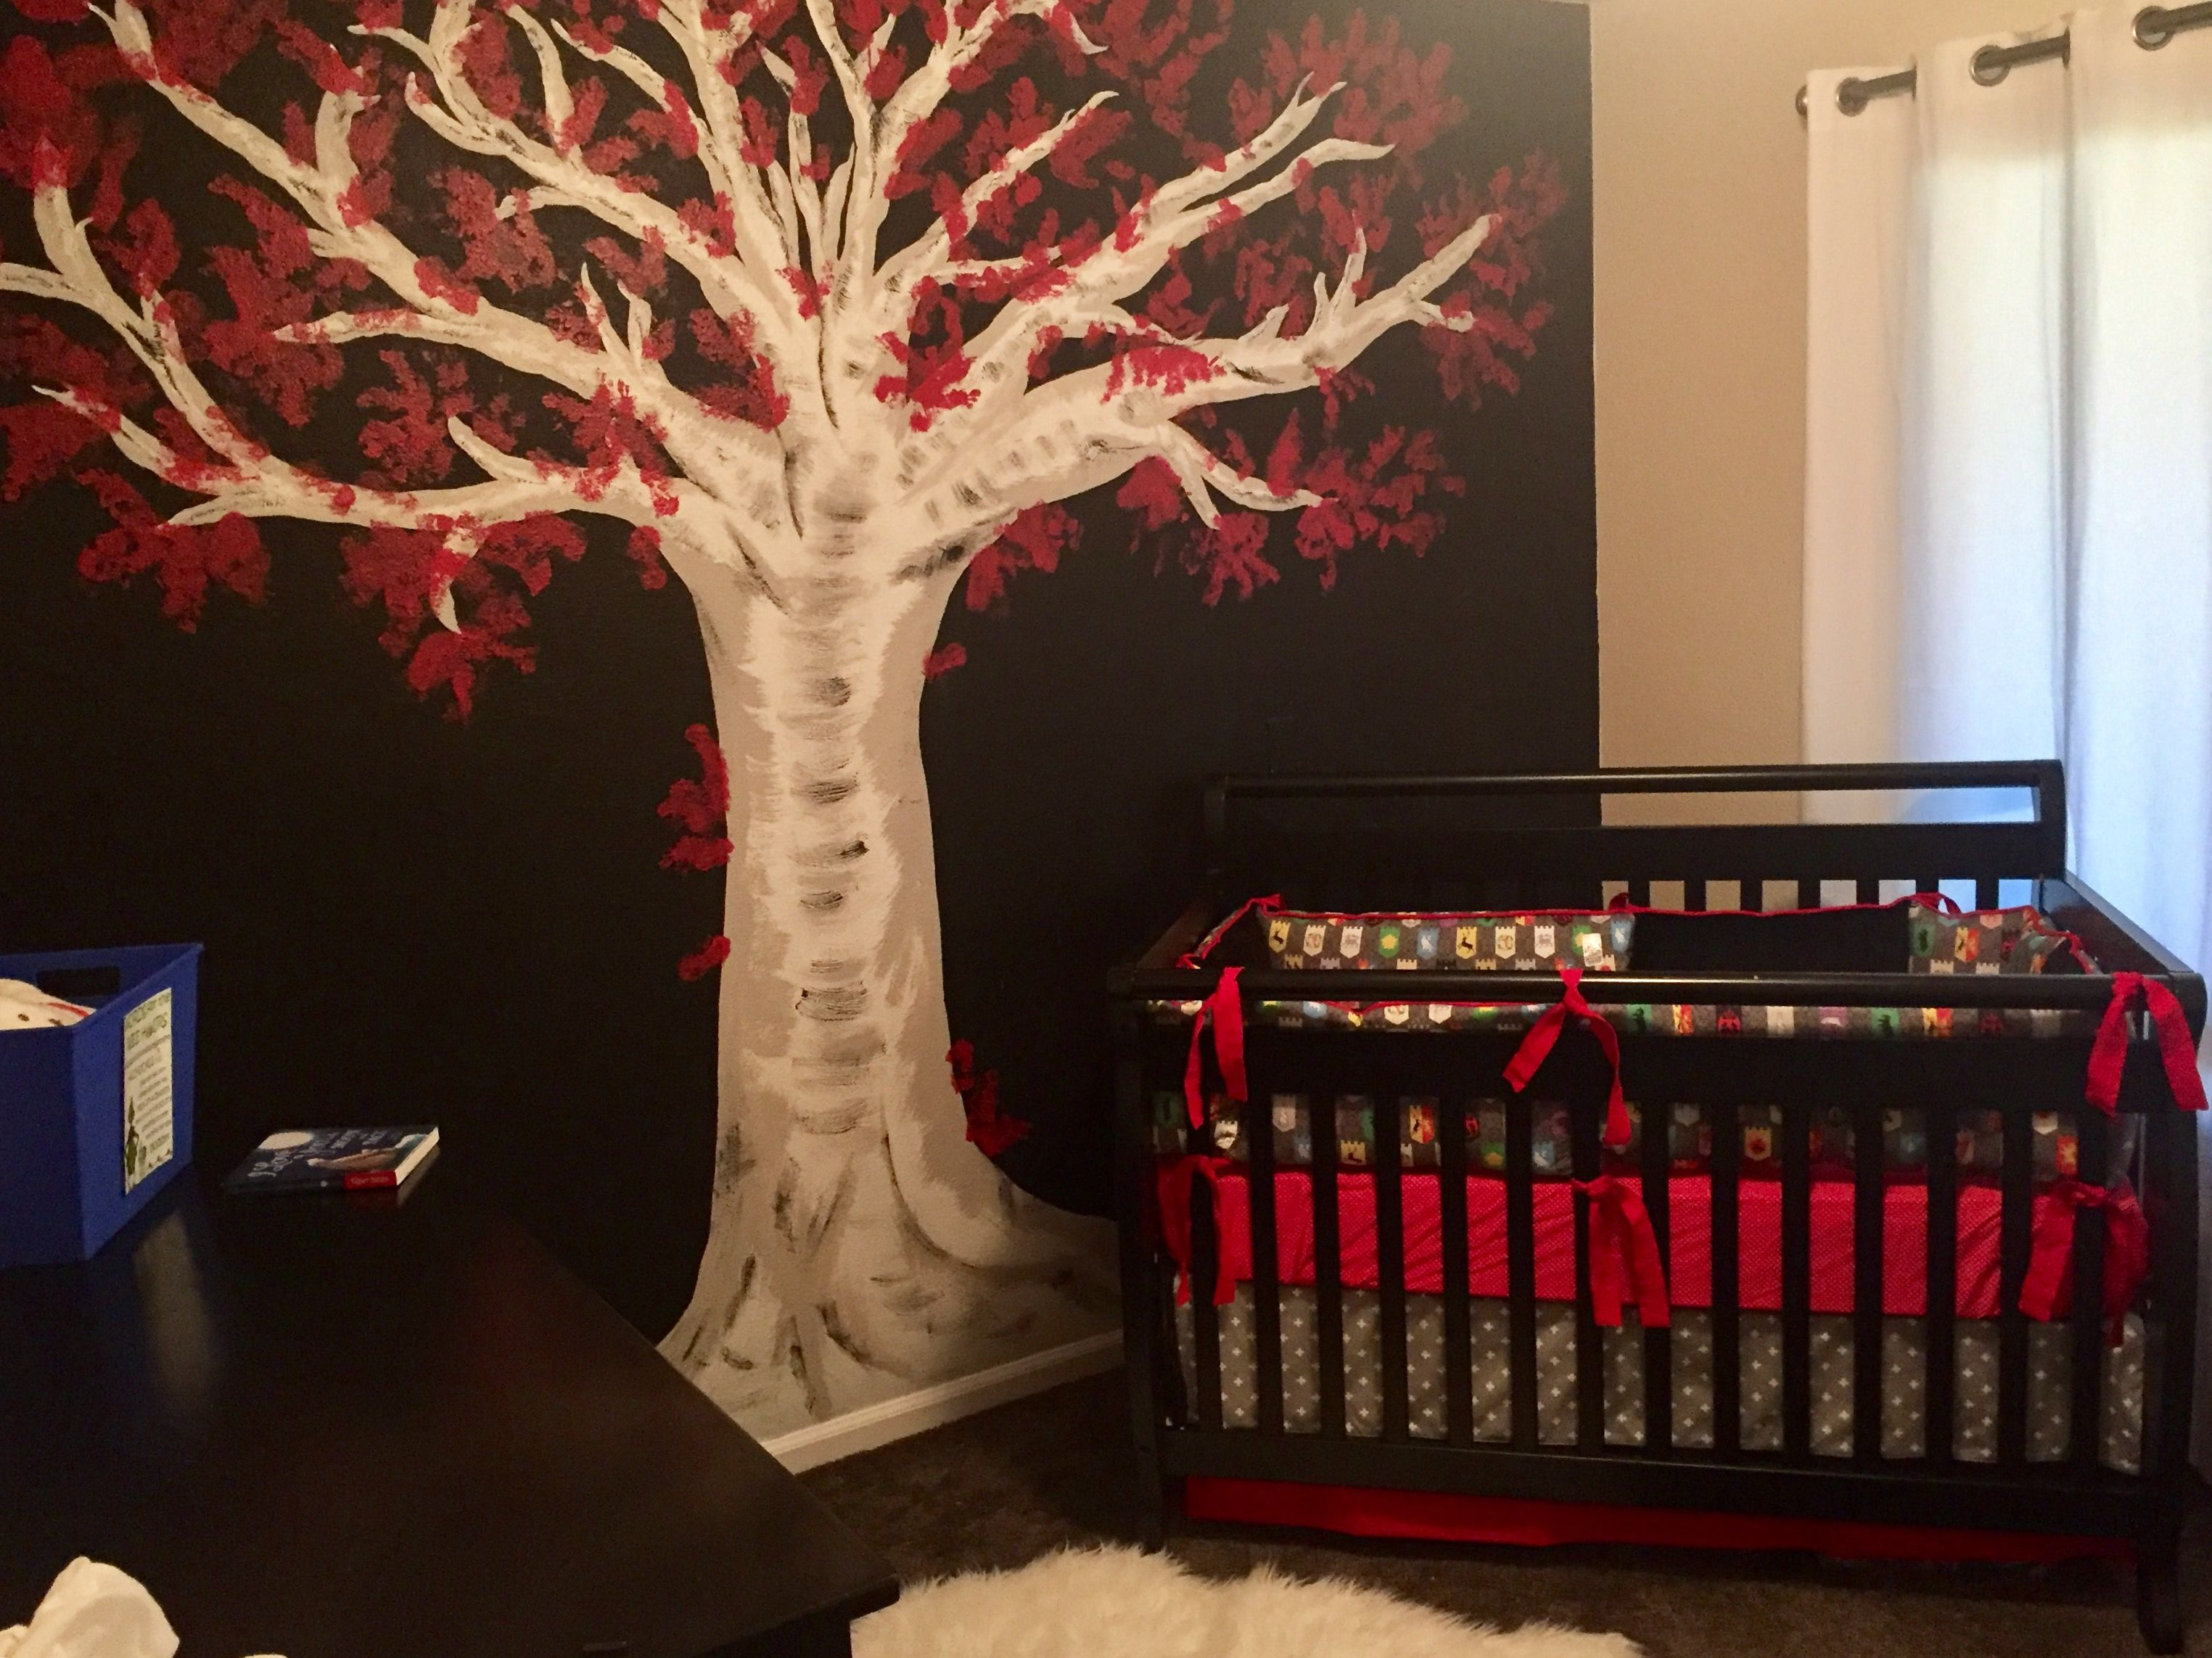 Of Thrones Nursery Crib Set The Baby Guy Oc House Sigils Print Spoonflower Weirwood Tree Mural Kid Friendly